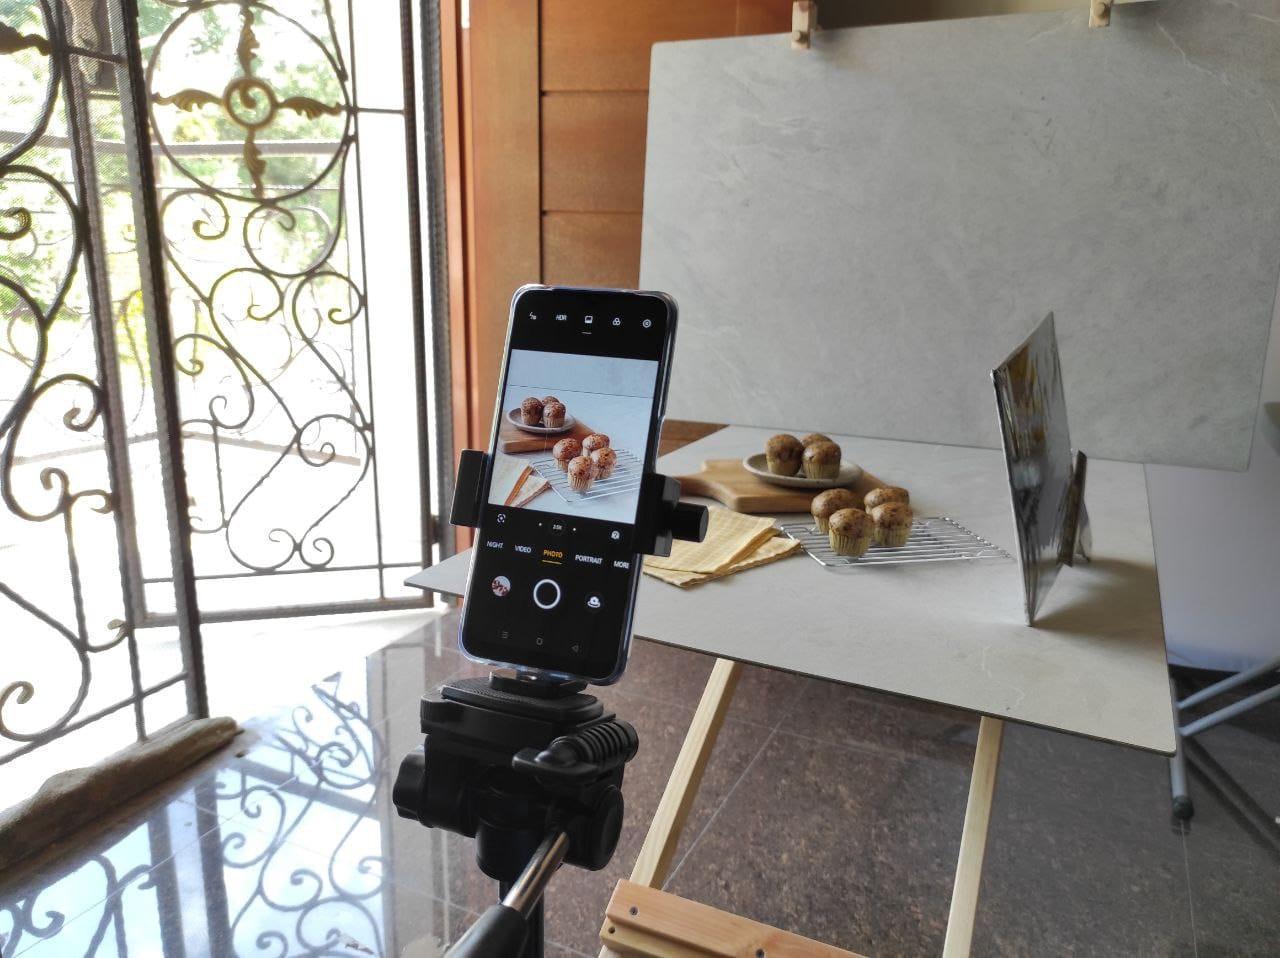 Foto Produk UMKM dari Smartphone - Meyani (1)